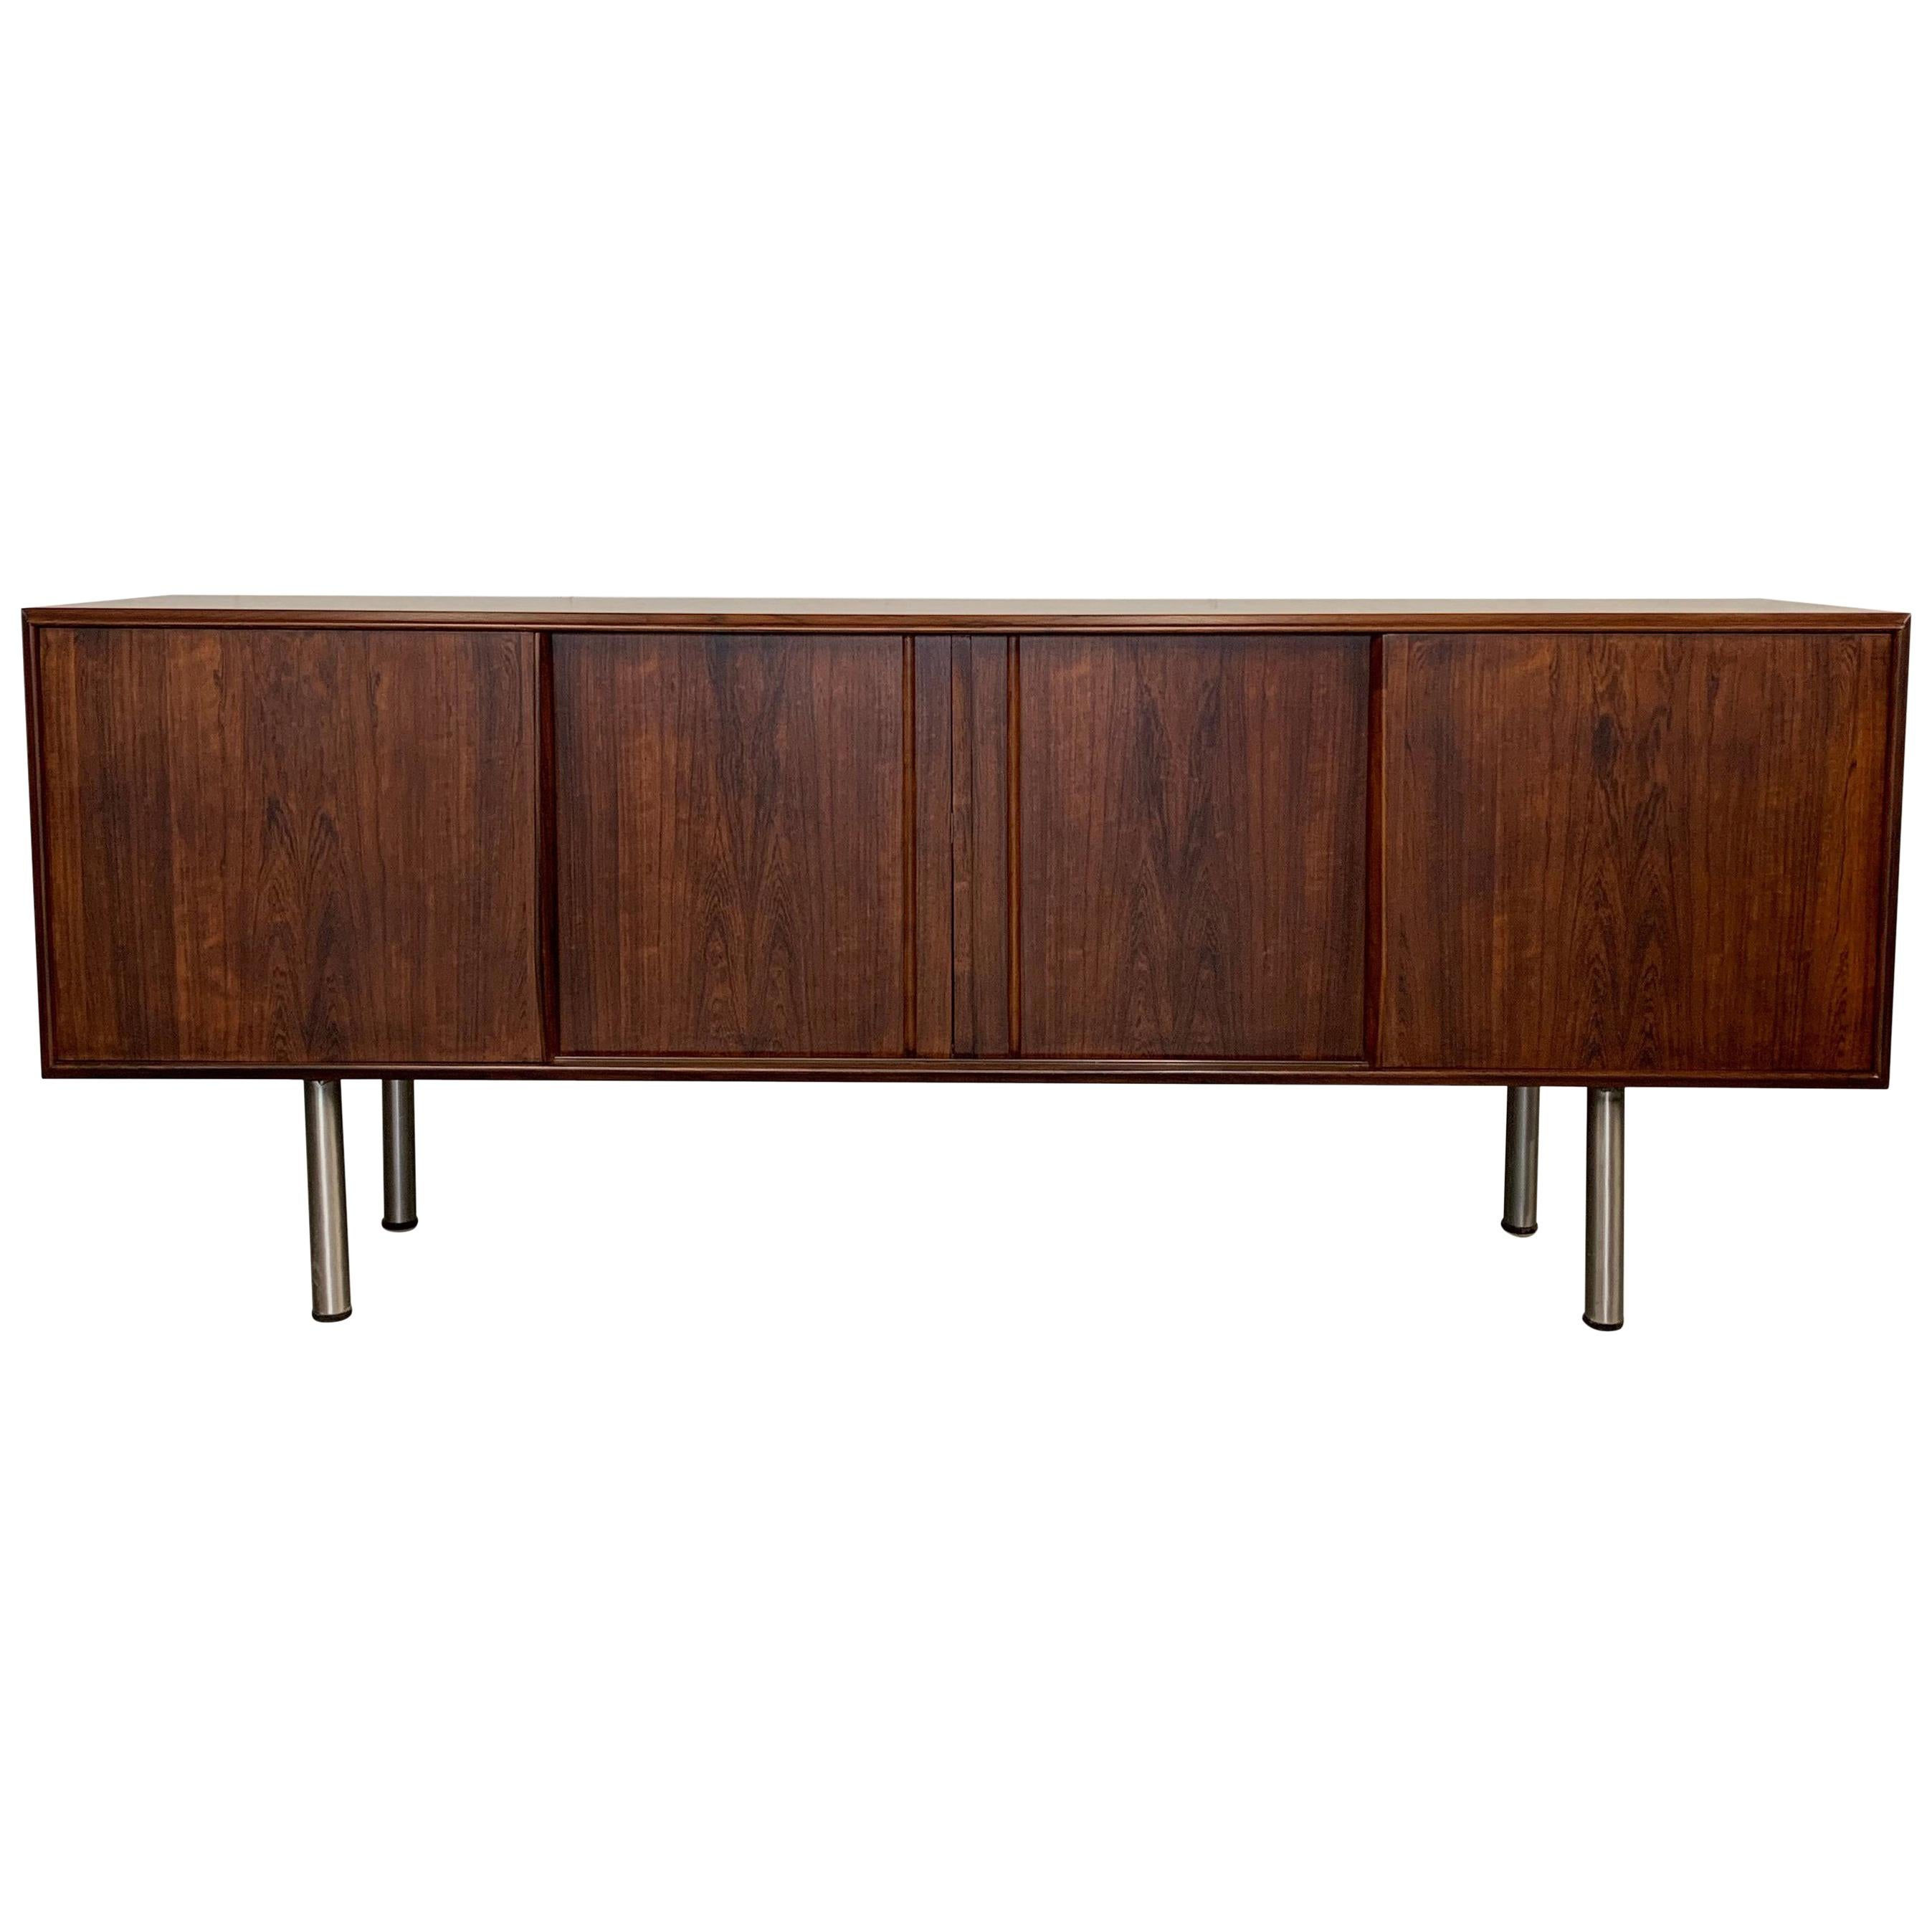 Danish Modern Rosewood Credenza Sideboard